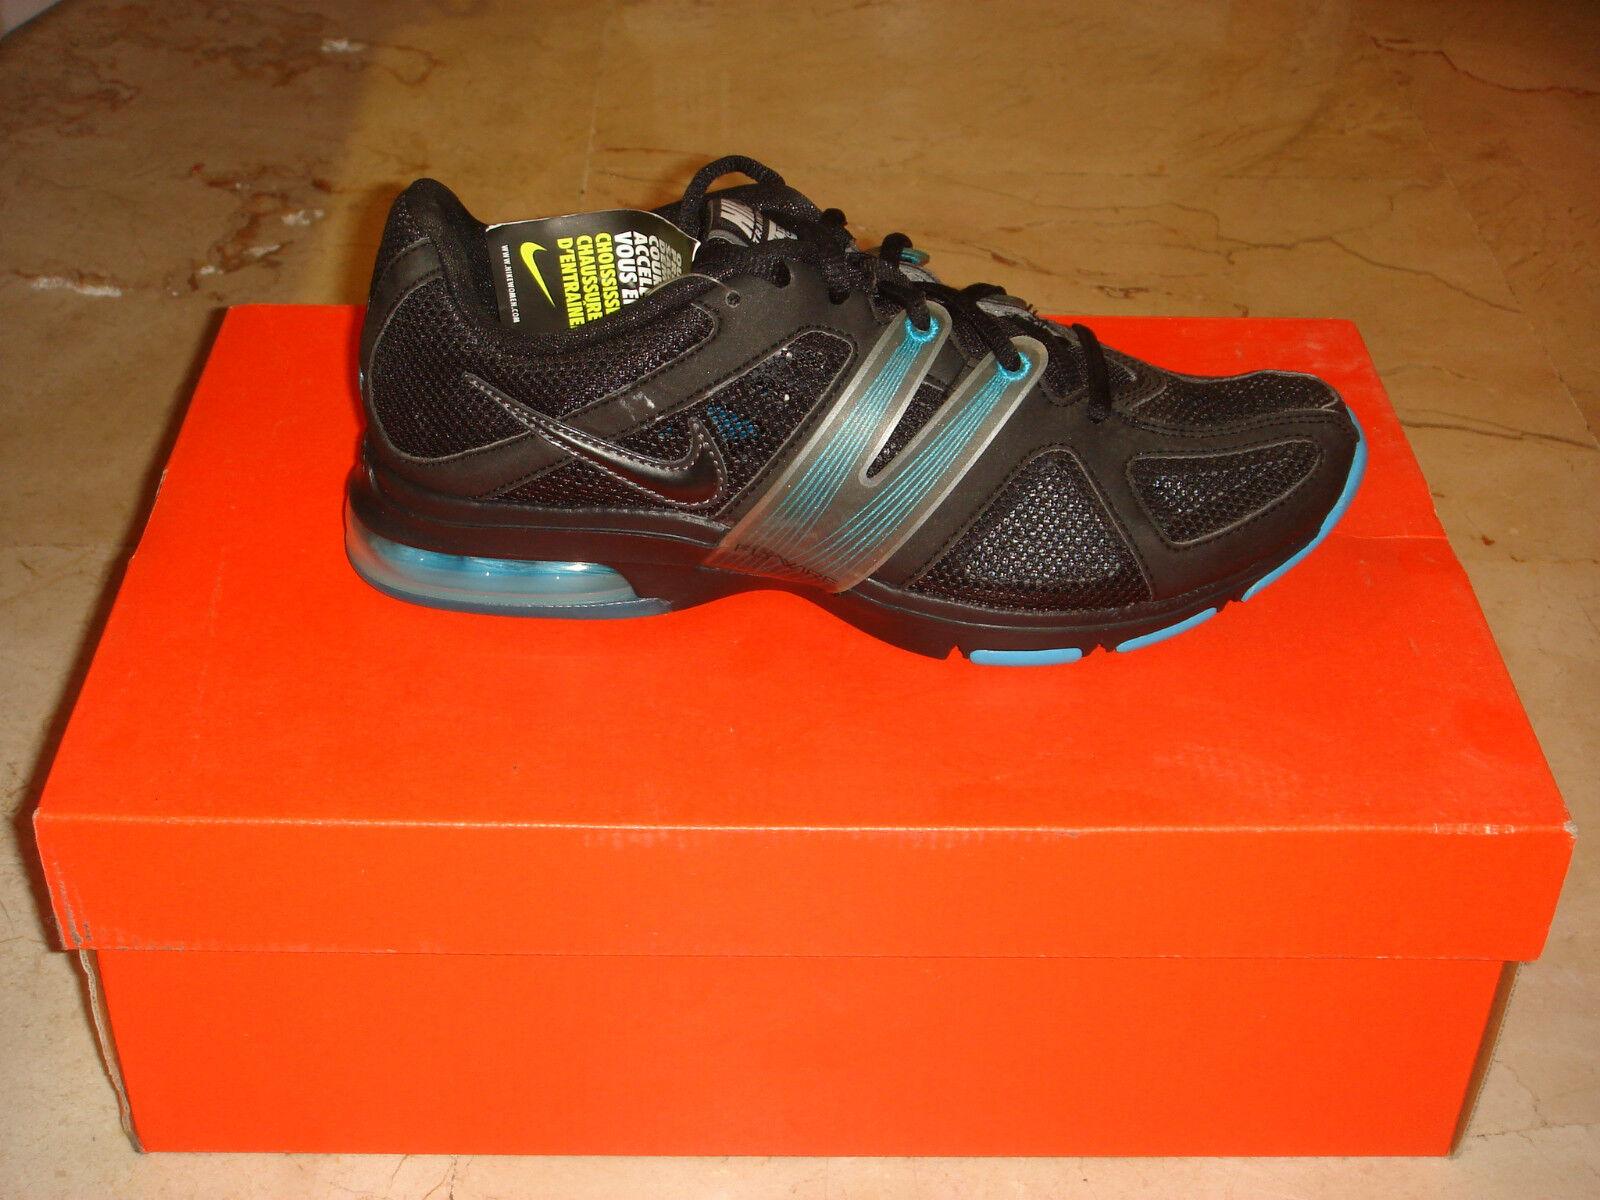 NIKE AIR MAX EXCEL cipő cipő eredeti NIKE NEGRO (ÁR KUPON 99EUROS)